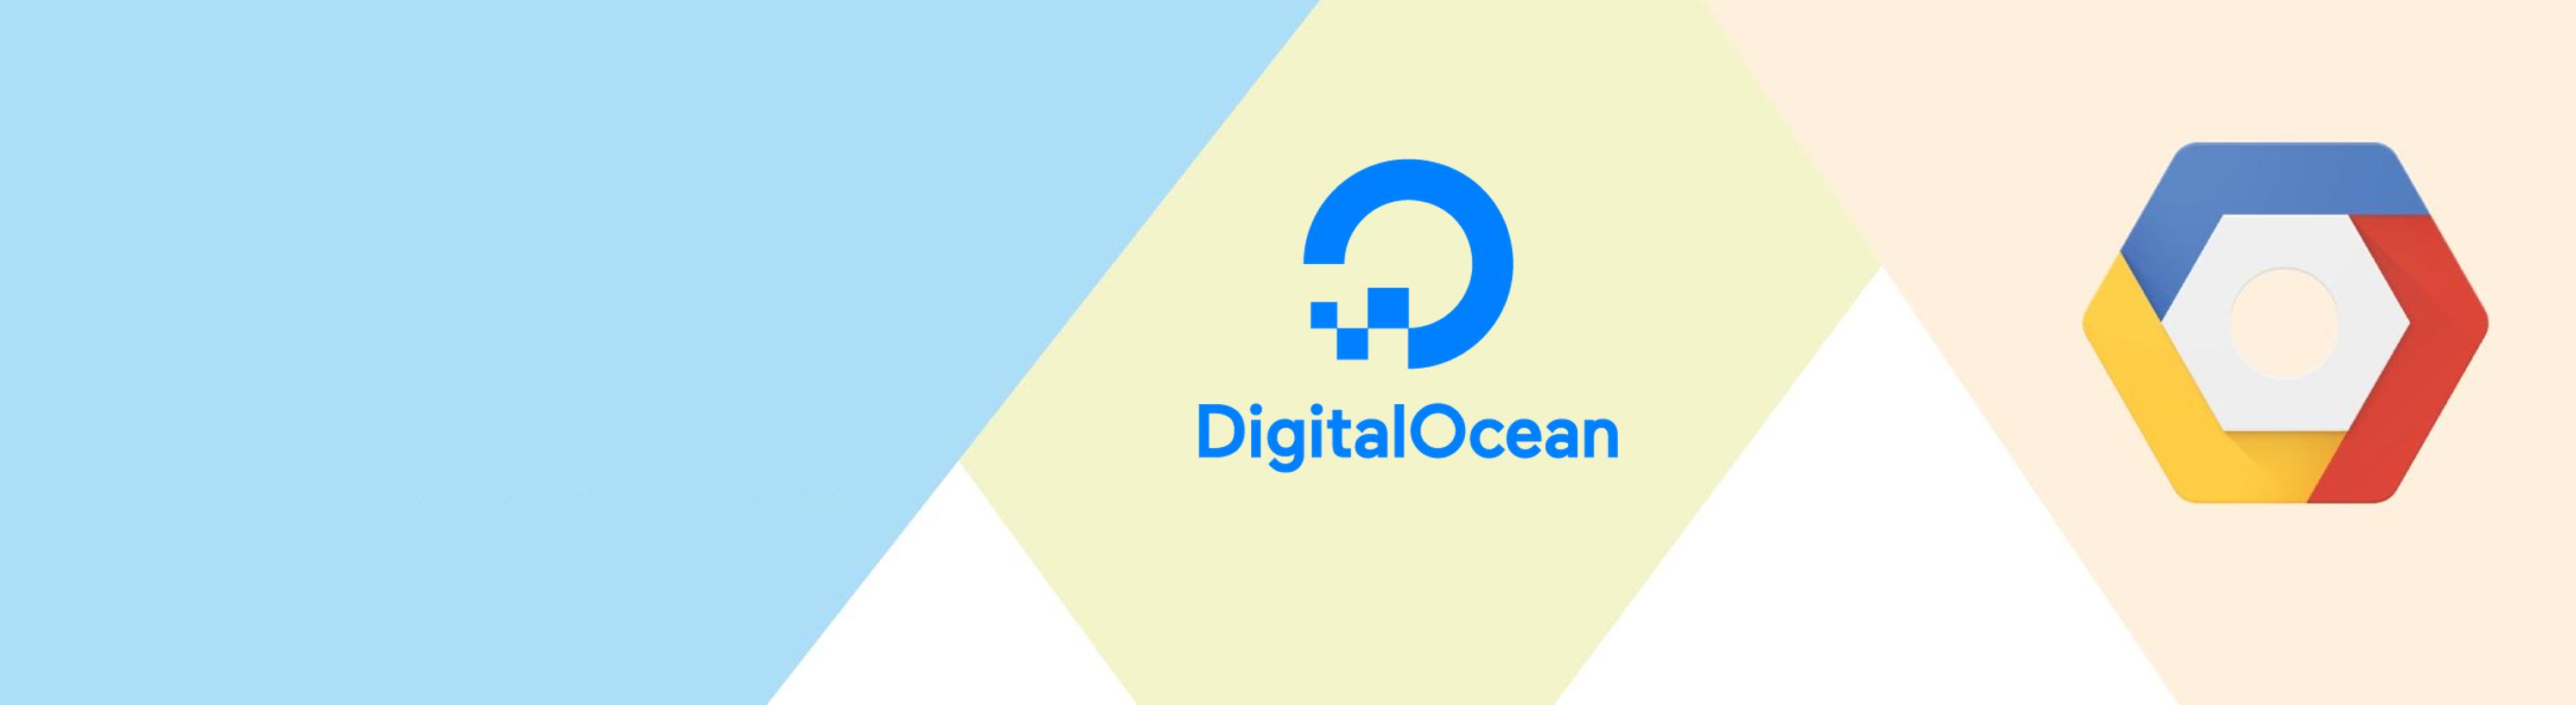 DigitalOcean Vs Google Cloud Platform